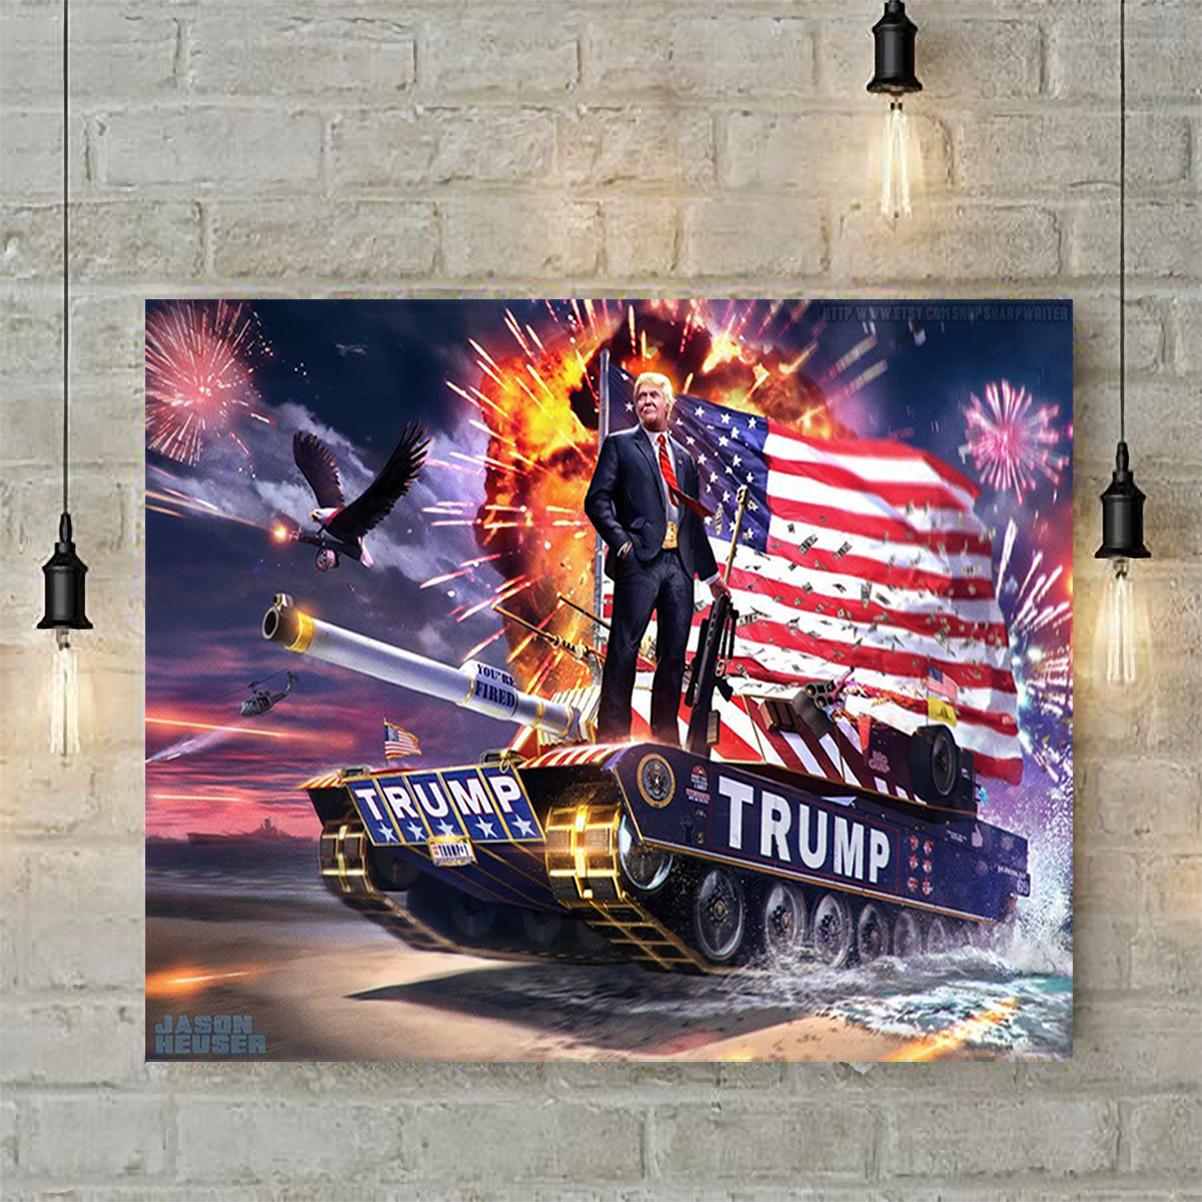 Trump tank poster A2